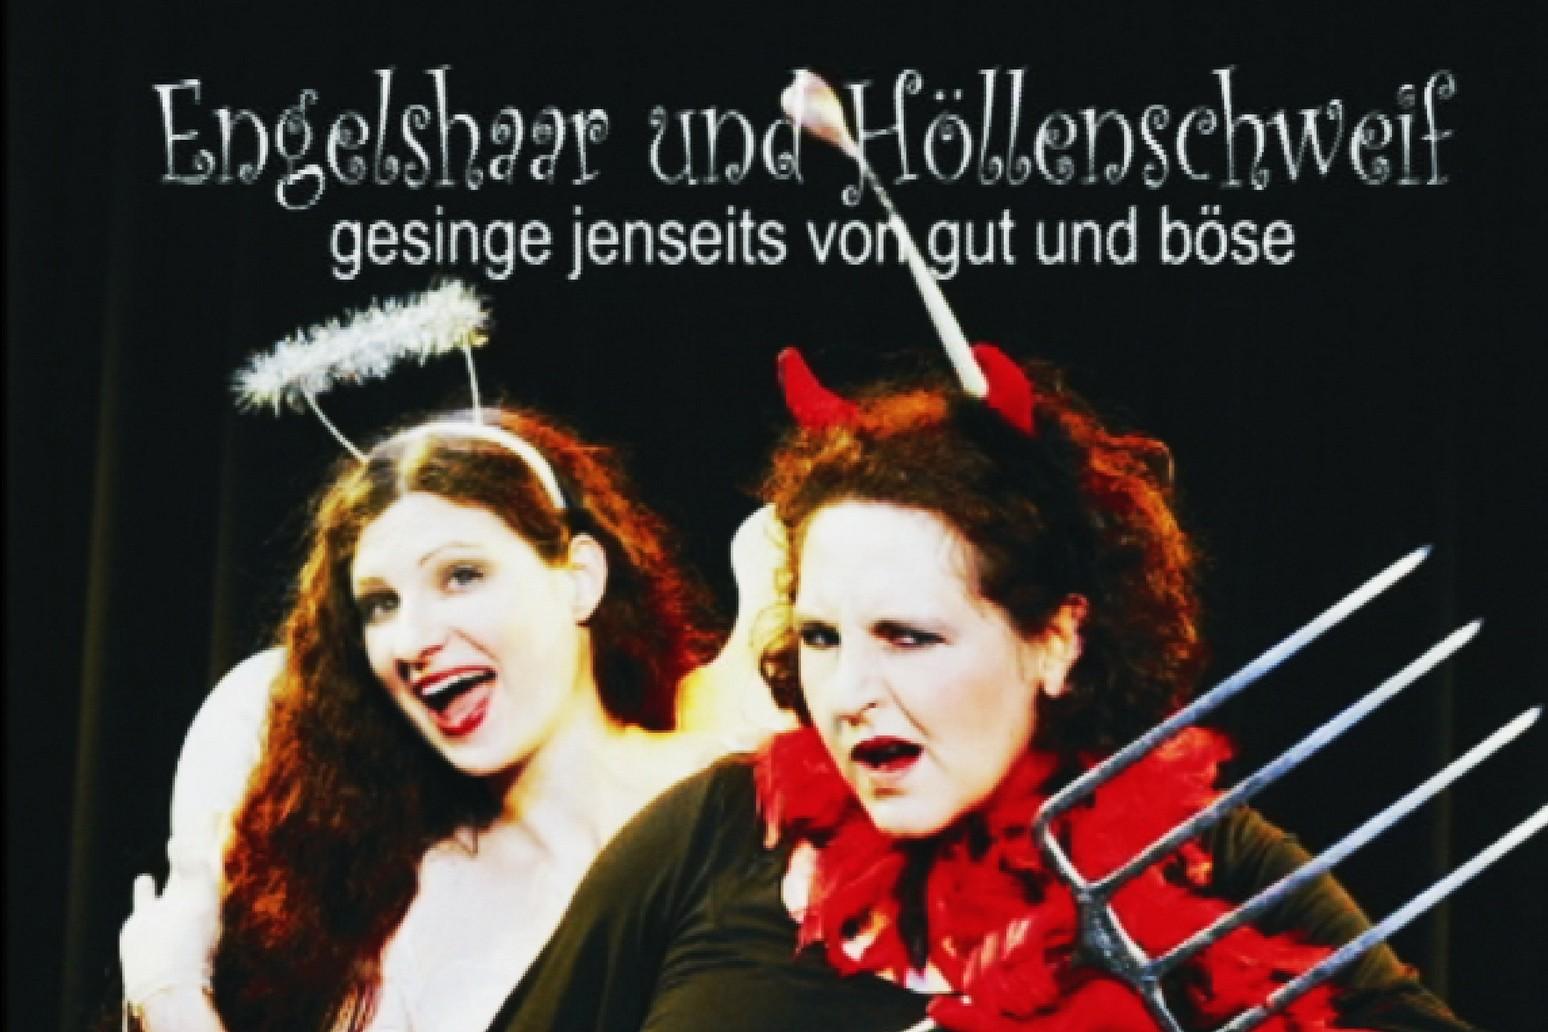 Medley Engelshaar und Höllenschweif